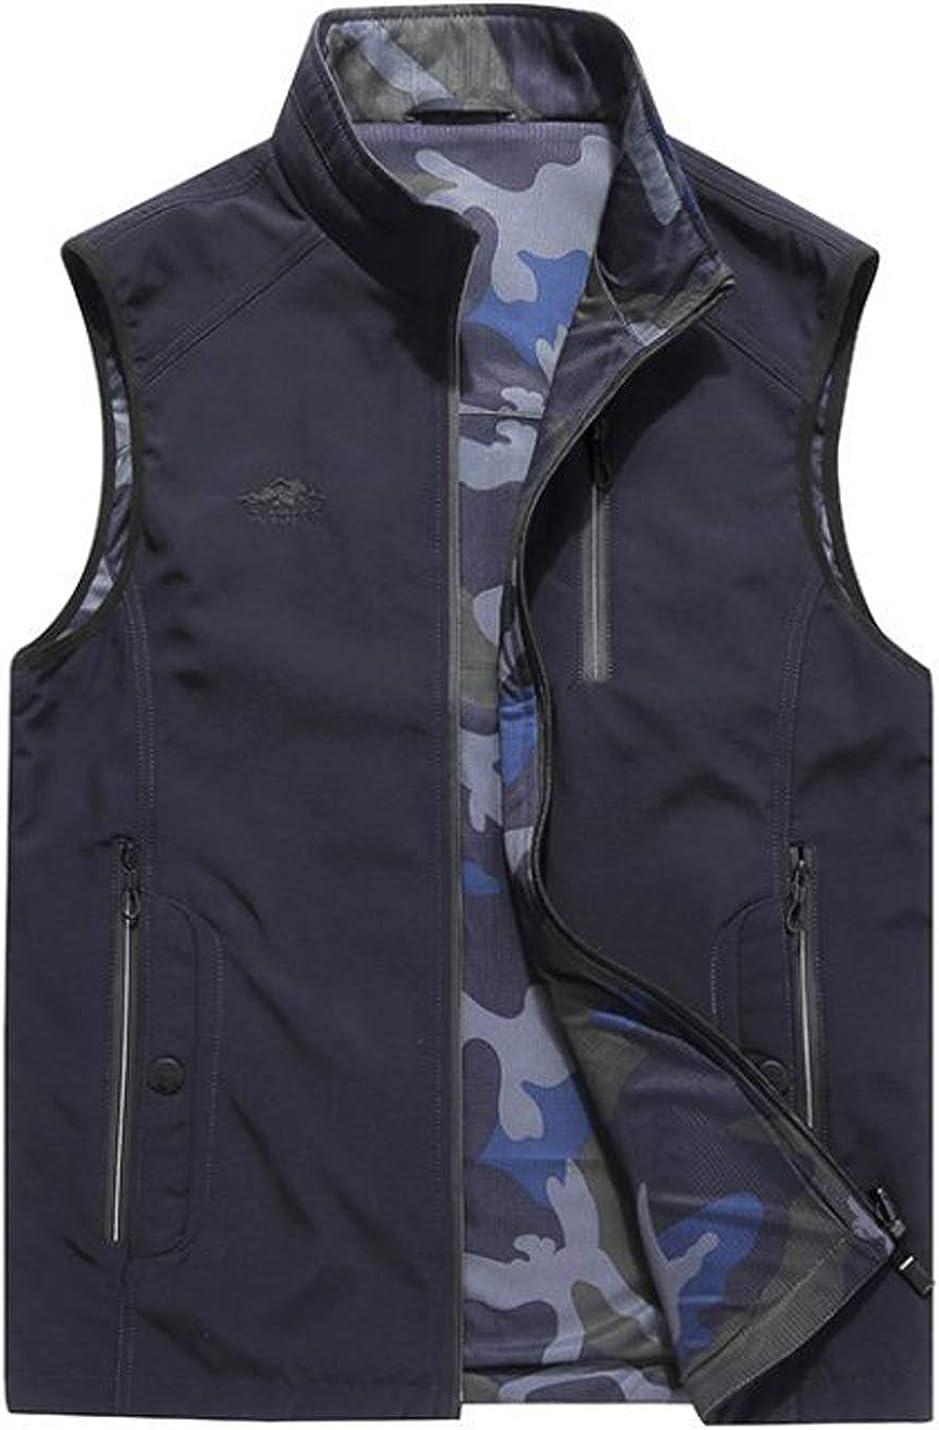 D.B.M Men's Lightweight 0utdoor Casual Cotton Multi-Pocket Double-Sided Vest